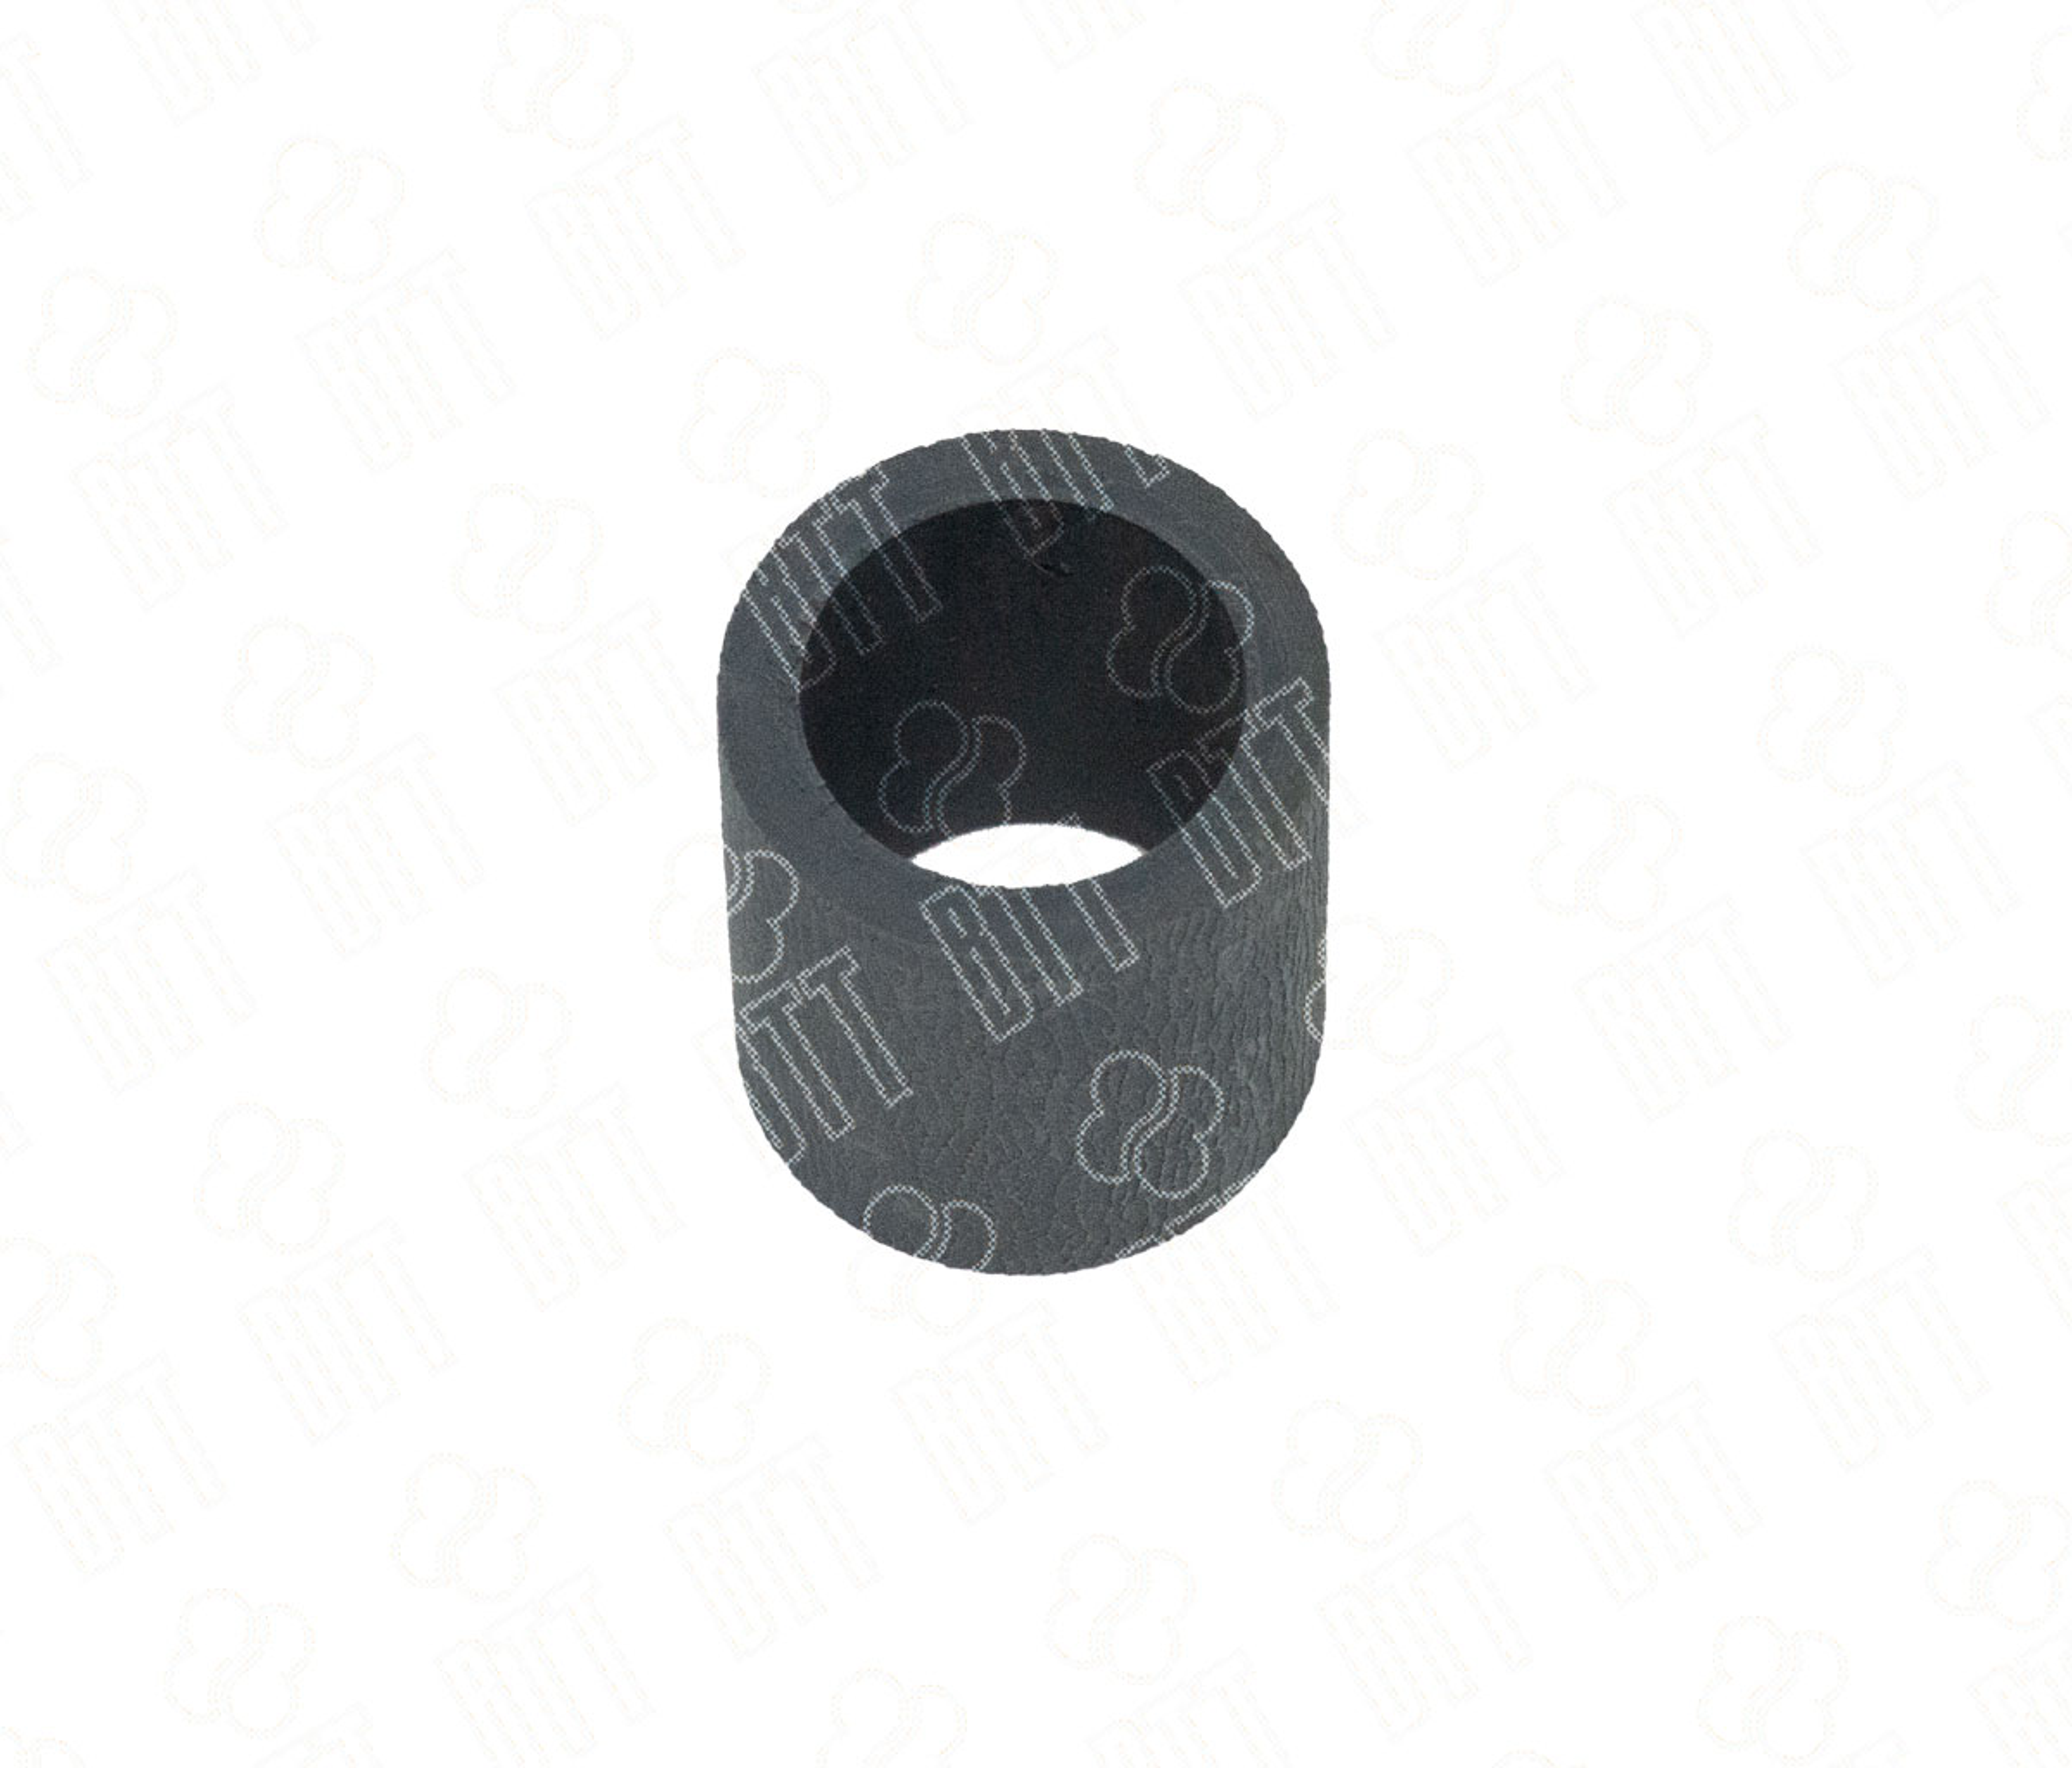 Насадка  (резинка) ролика захвата совм. для Samsung ML-1210/1250/Ph3110/3210/SF531P/E210